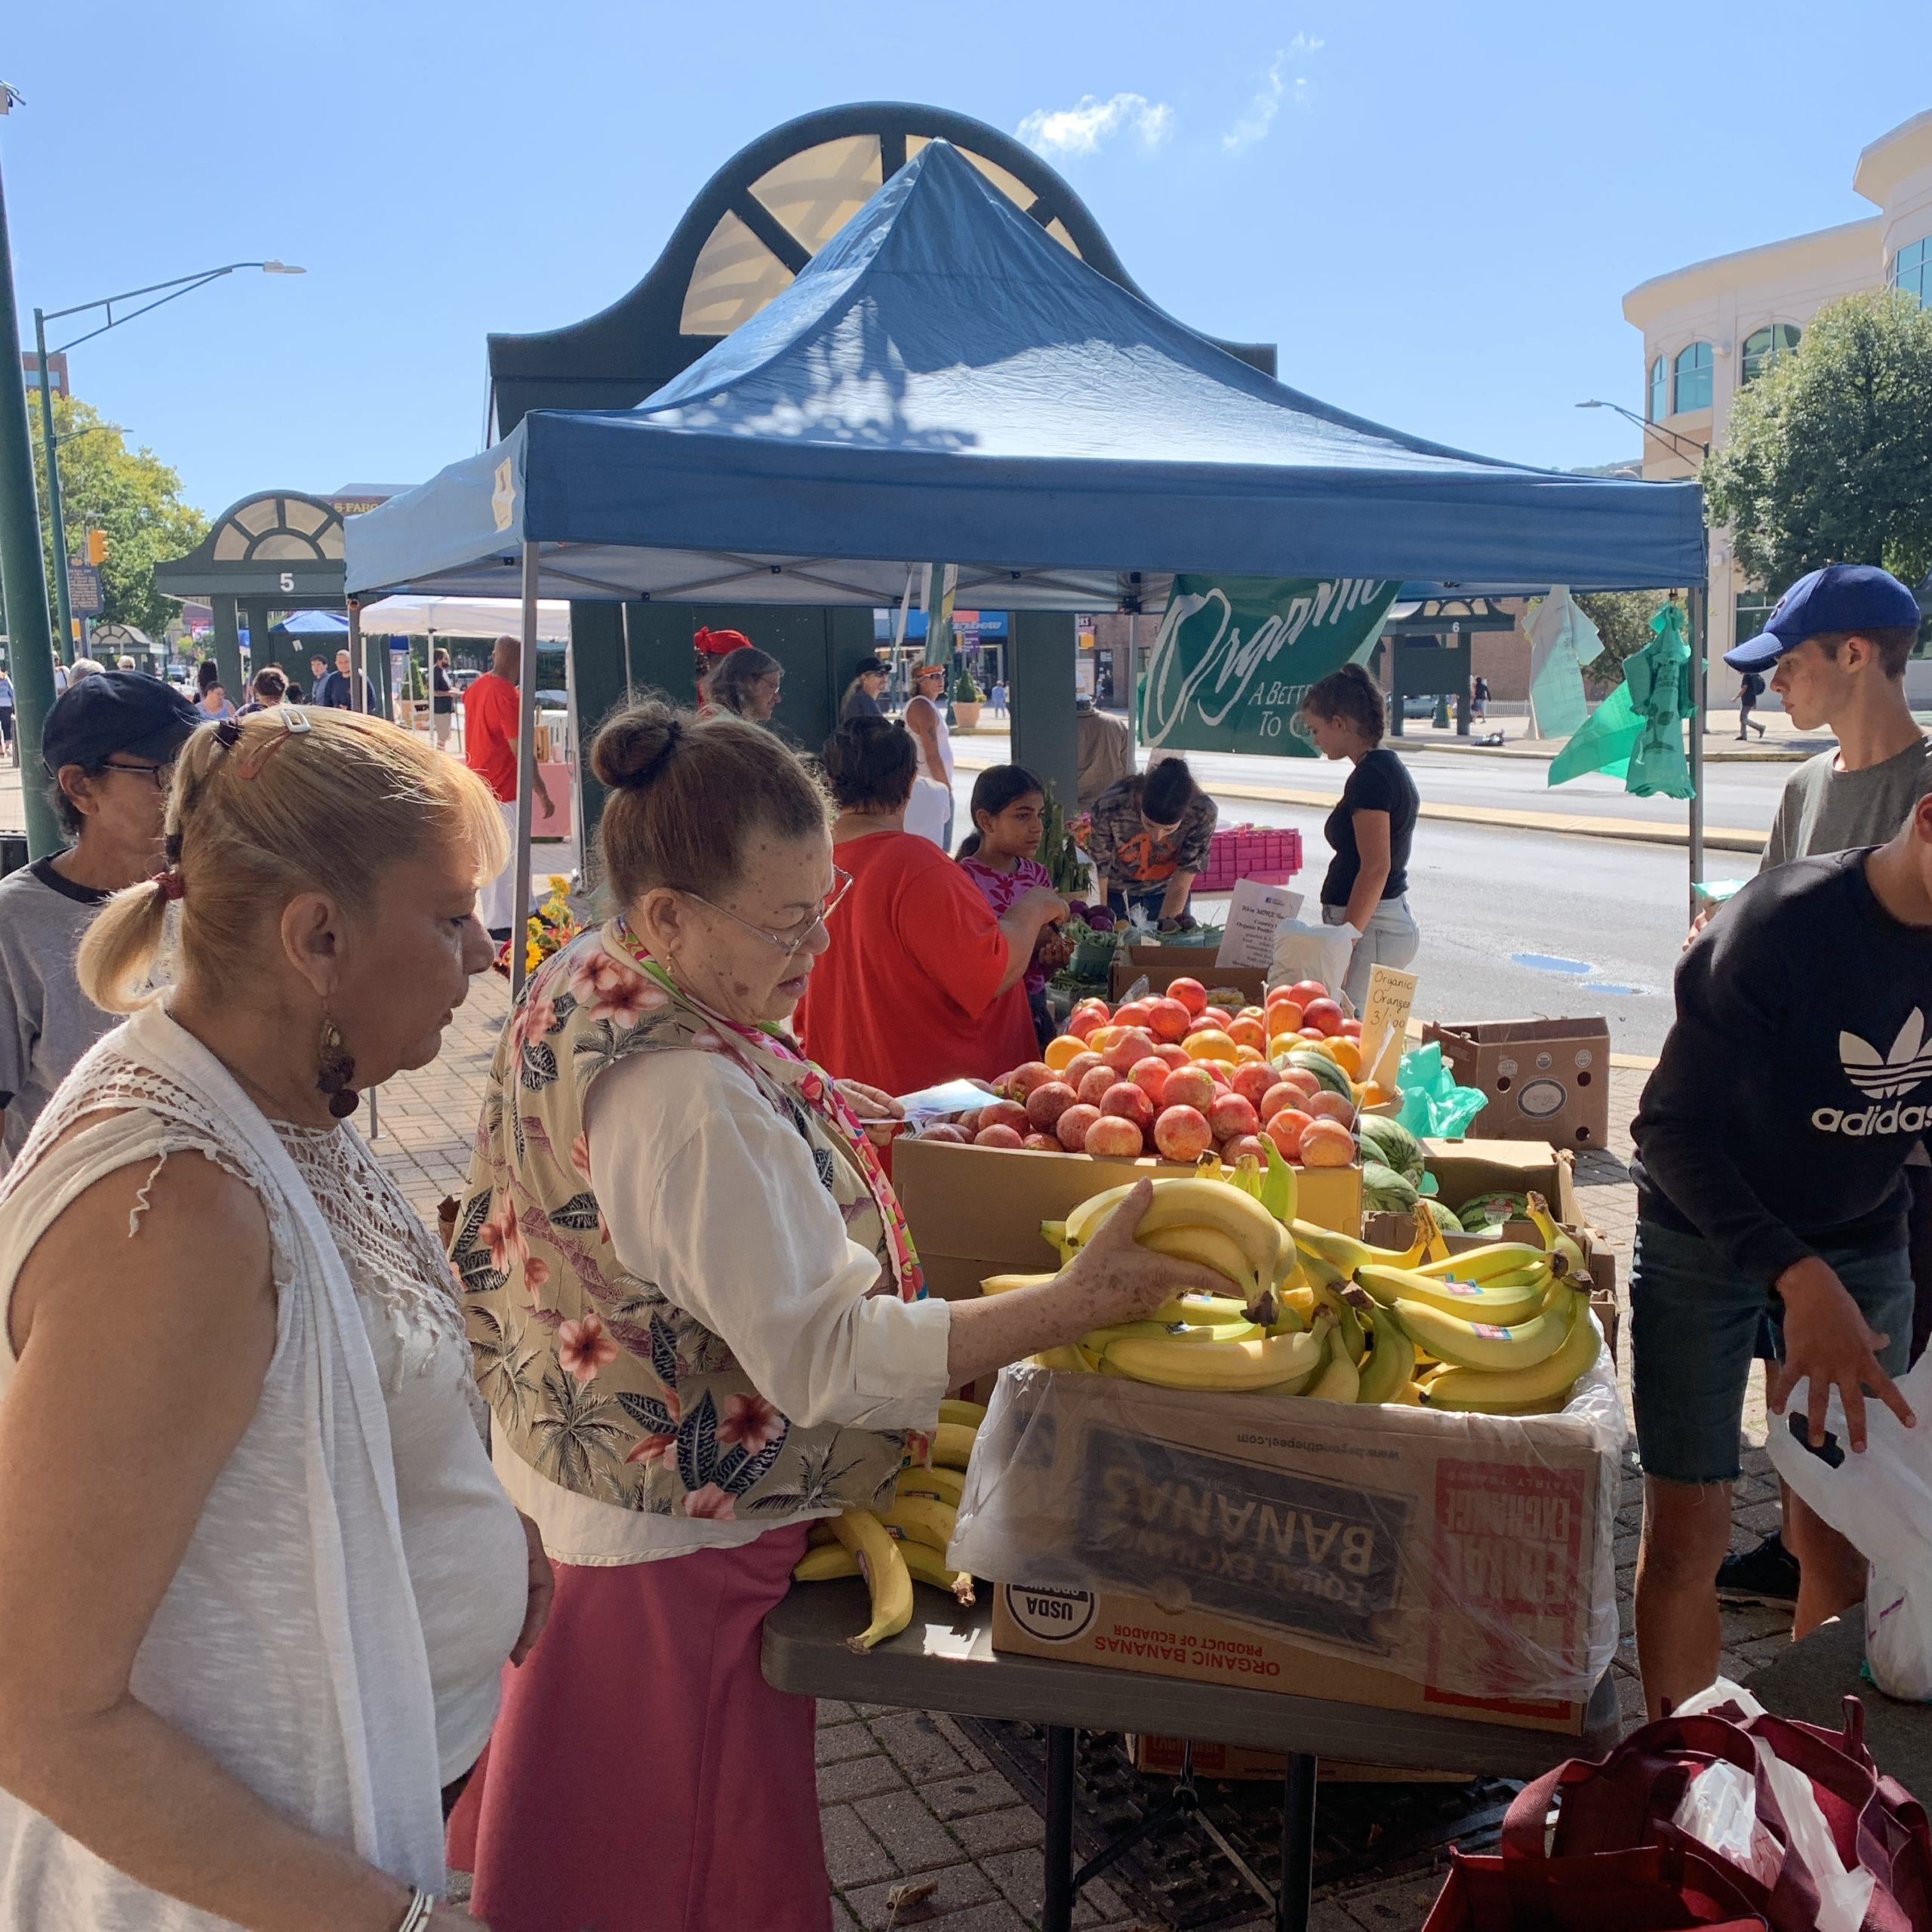 Penn Street Market Shoppers Downtown Reading